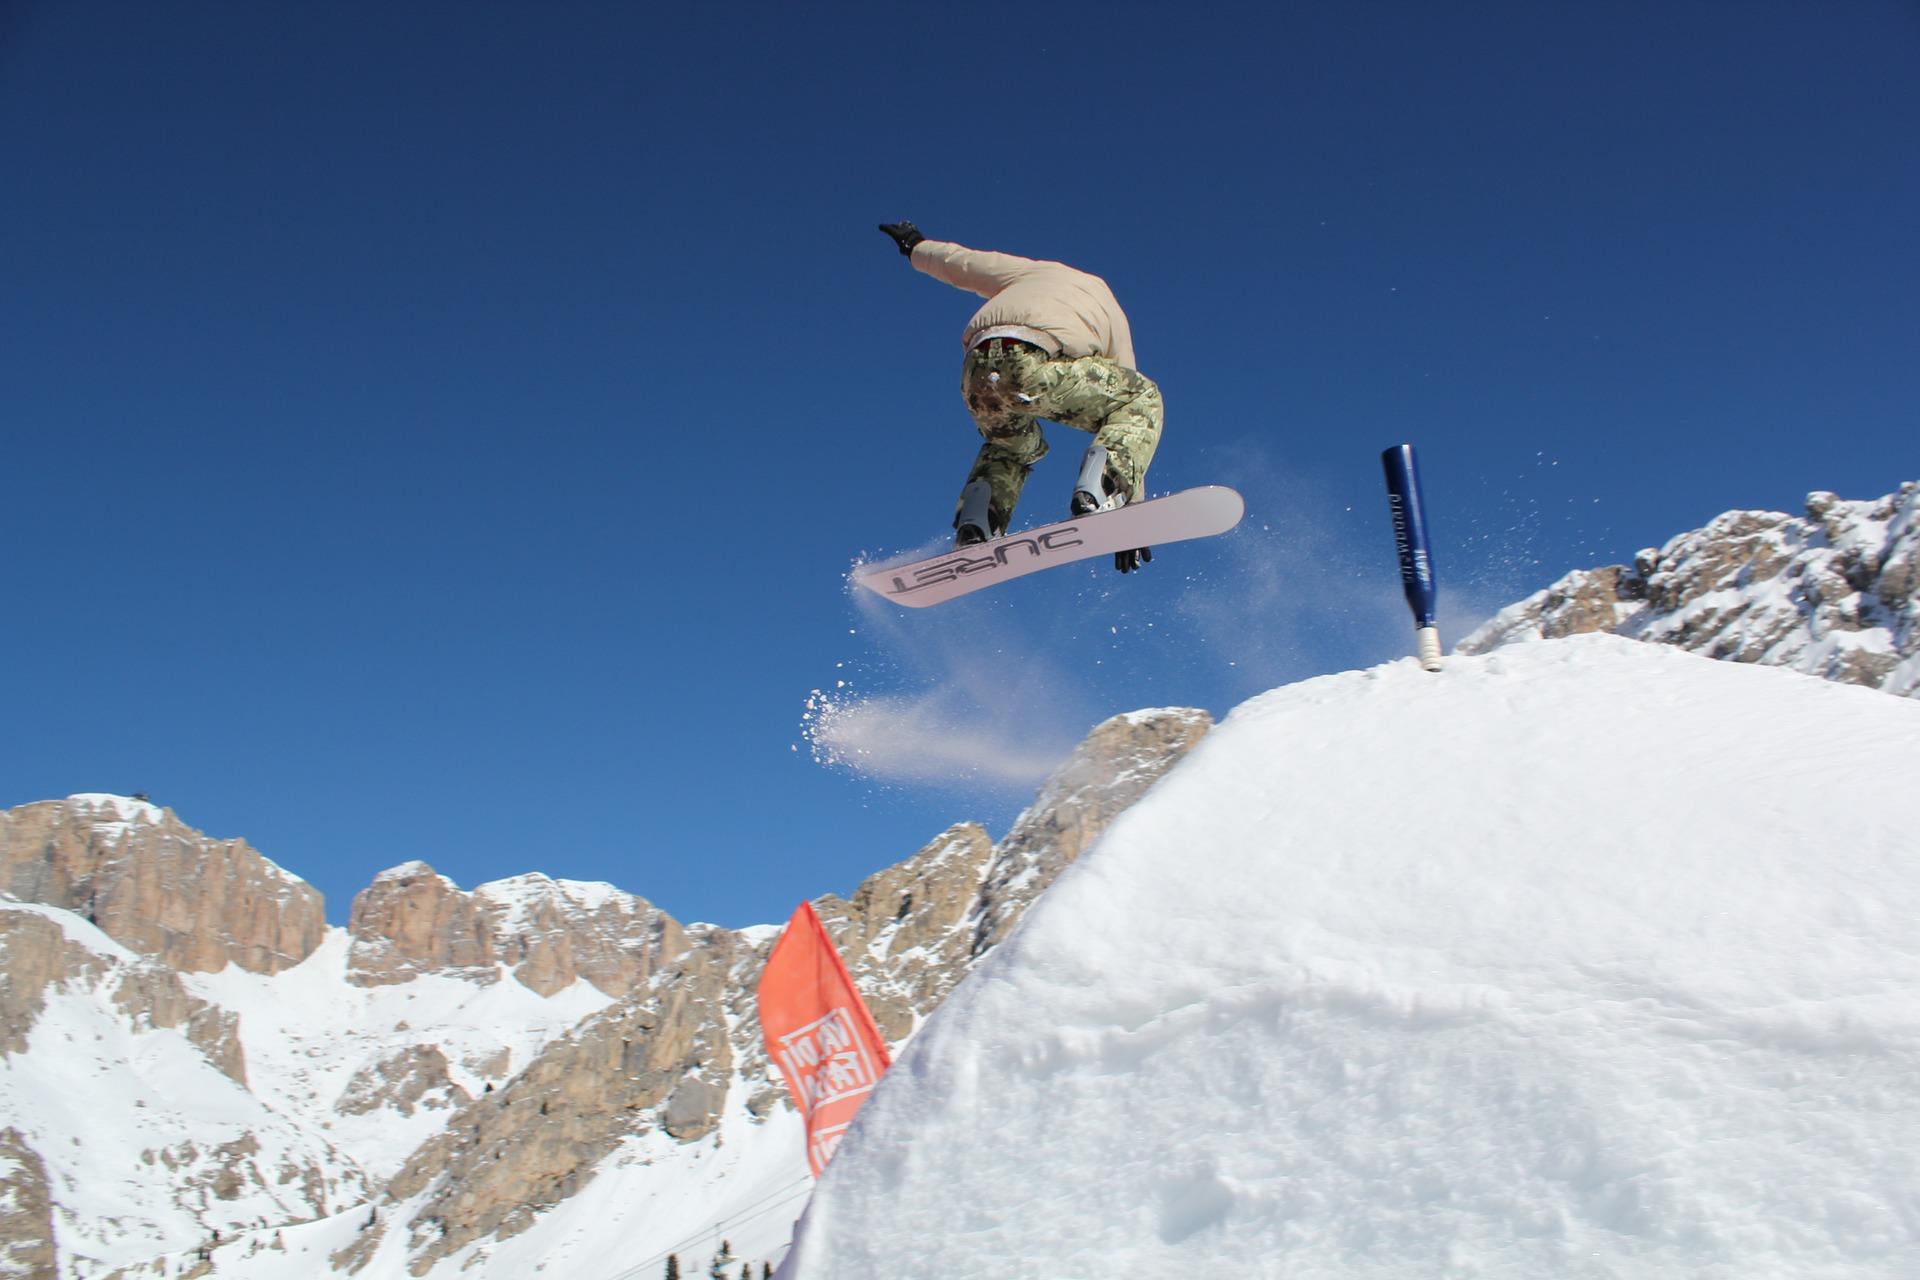 snowboarding-1161799_1920